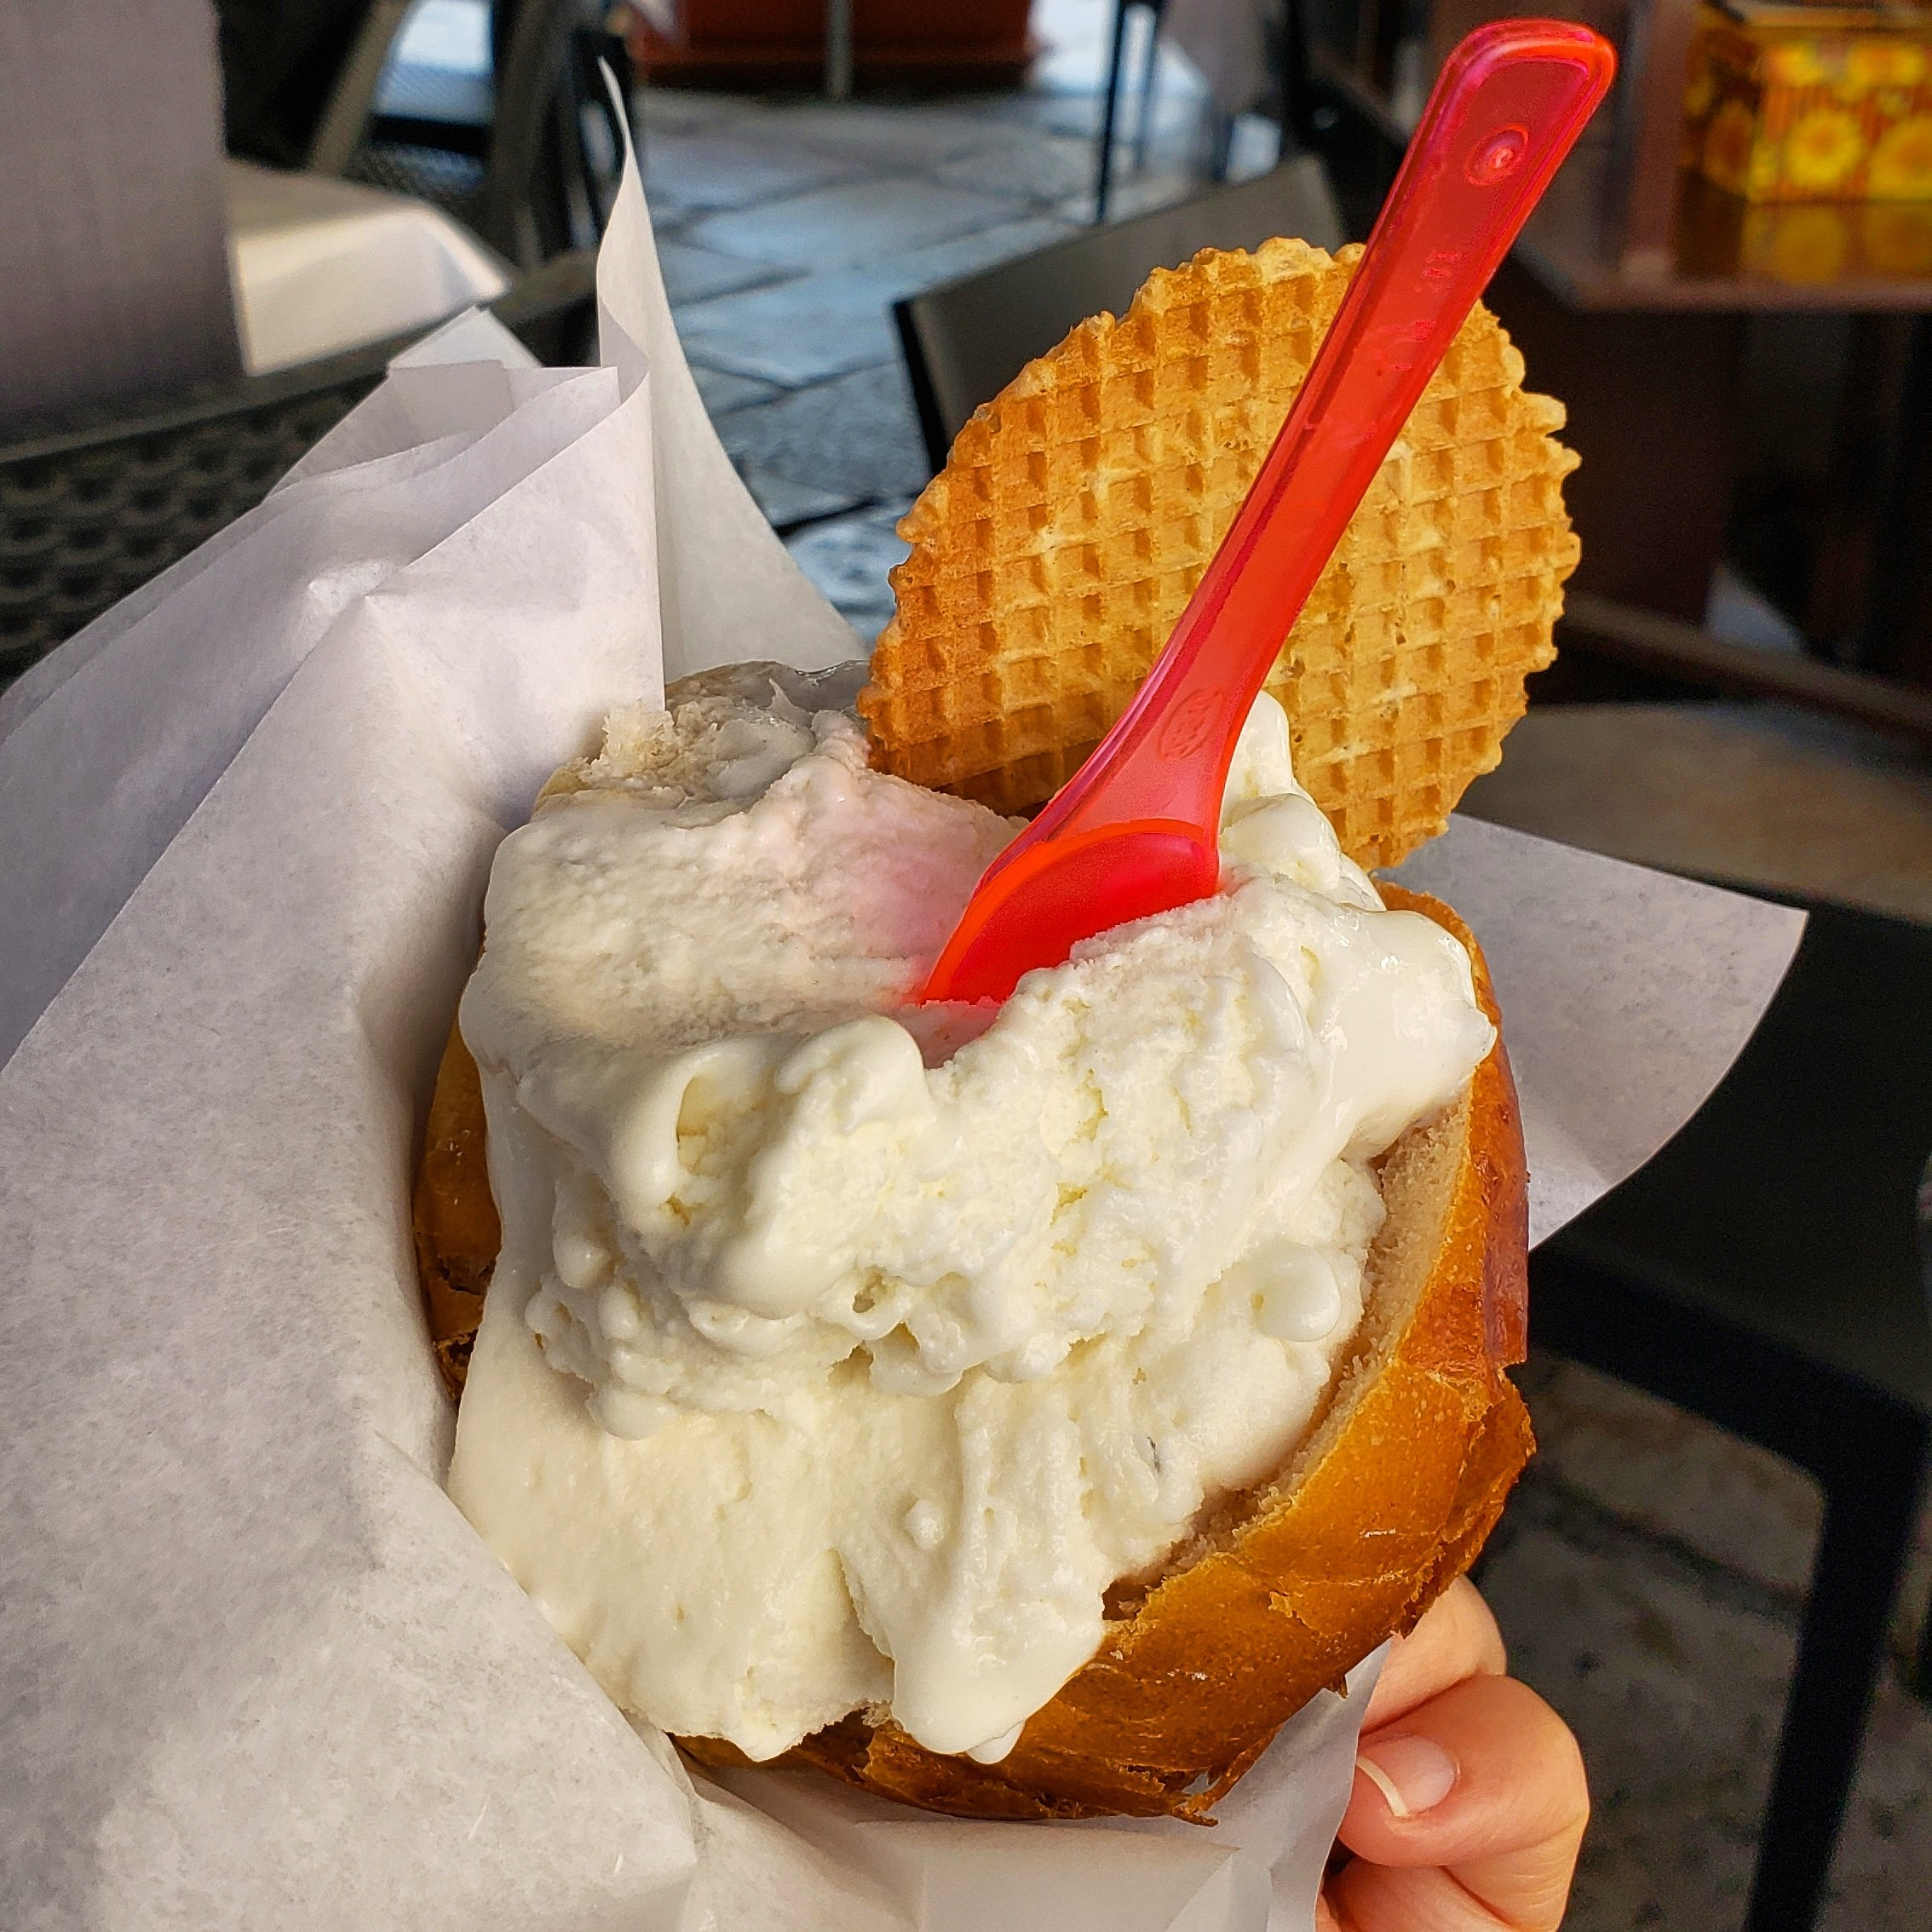 52 Reasons to Love Sicily   #36. Gelato in a Sweet Brioche